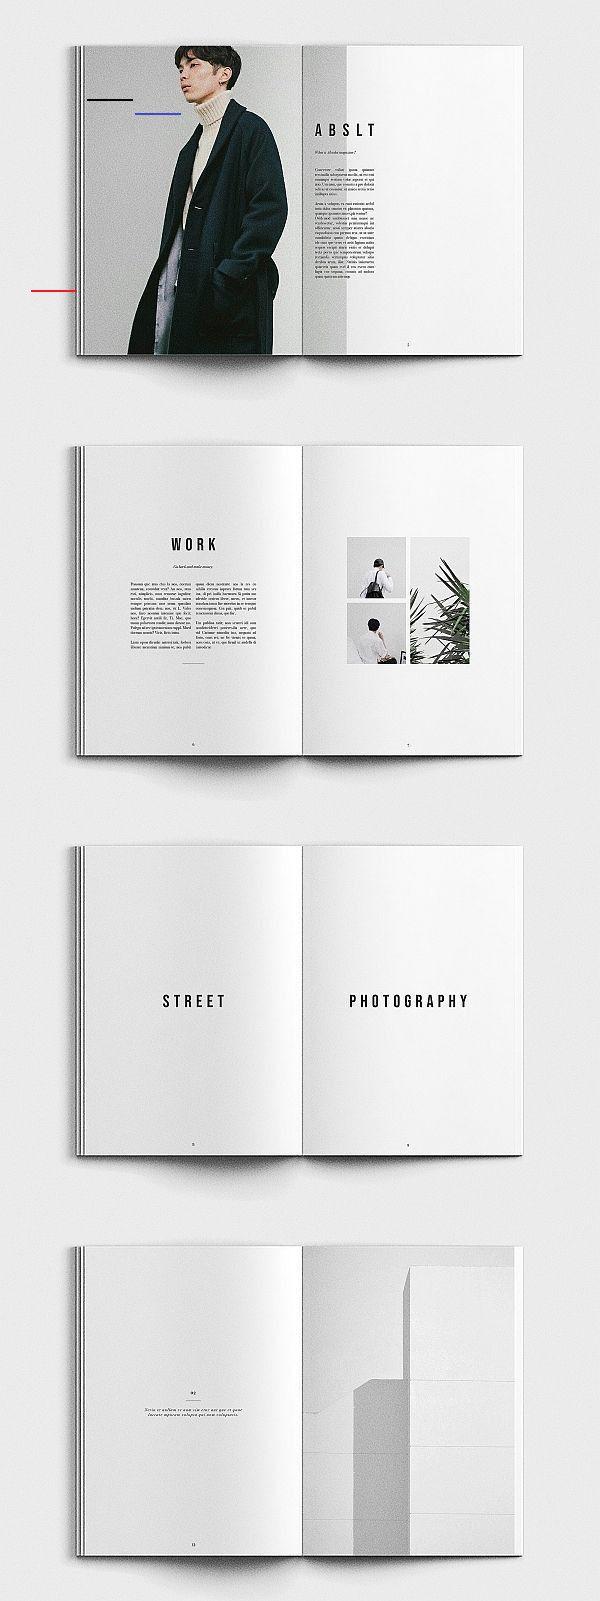 Absolut Photography Portofolio Broschyr Design Layoutdesign Broschyr